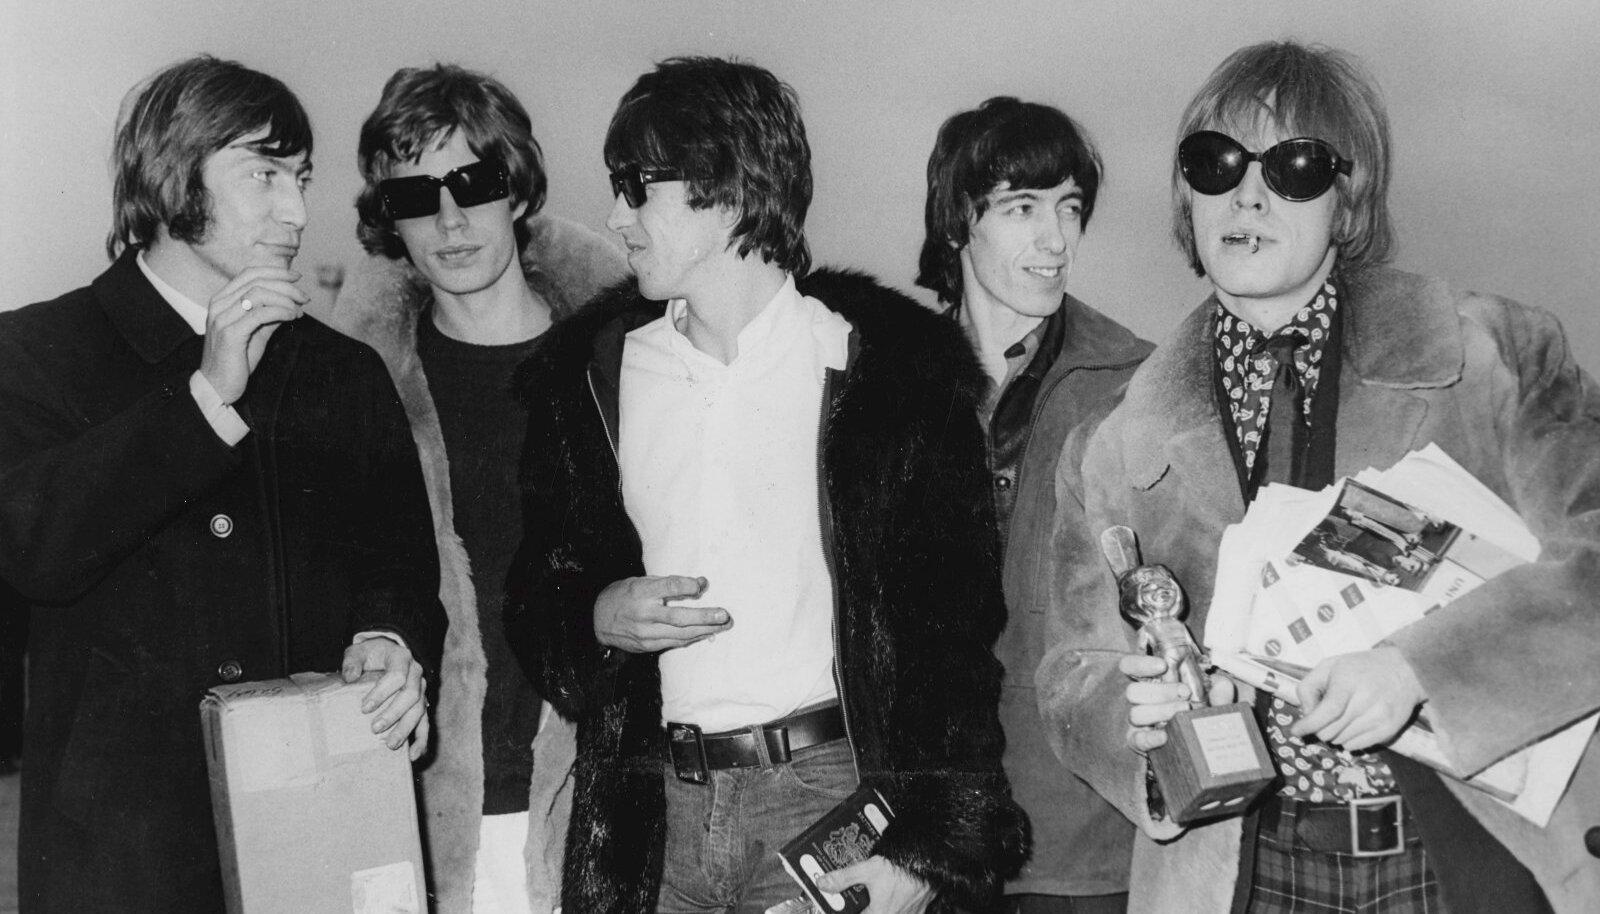 CHARLIE WATTS , MICK JAGGER , KEITH RICHARDS , BILL WYMAN and BRIAN JONES. APRILL 1966.